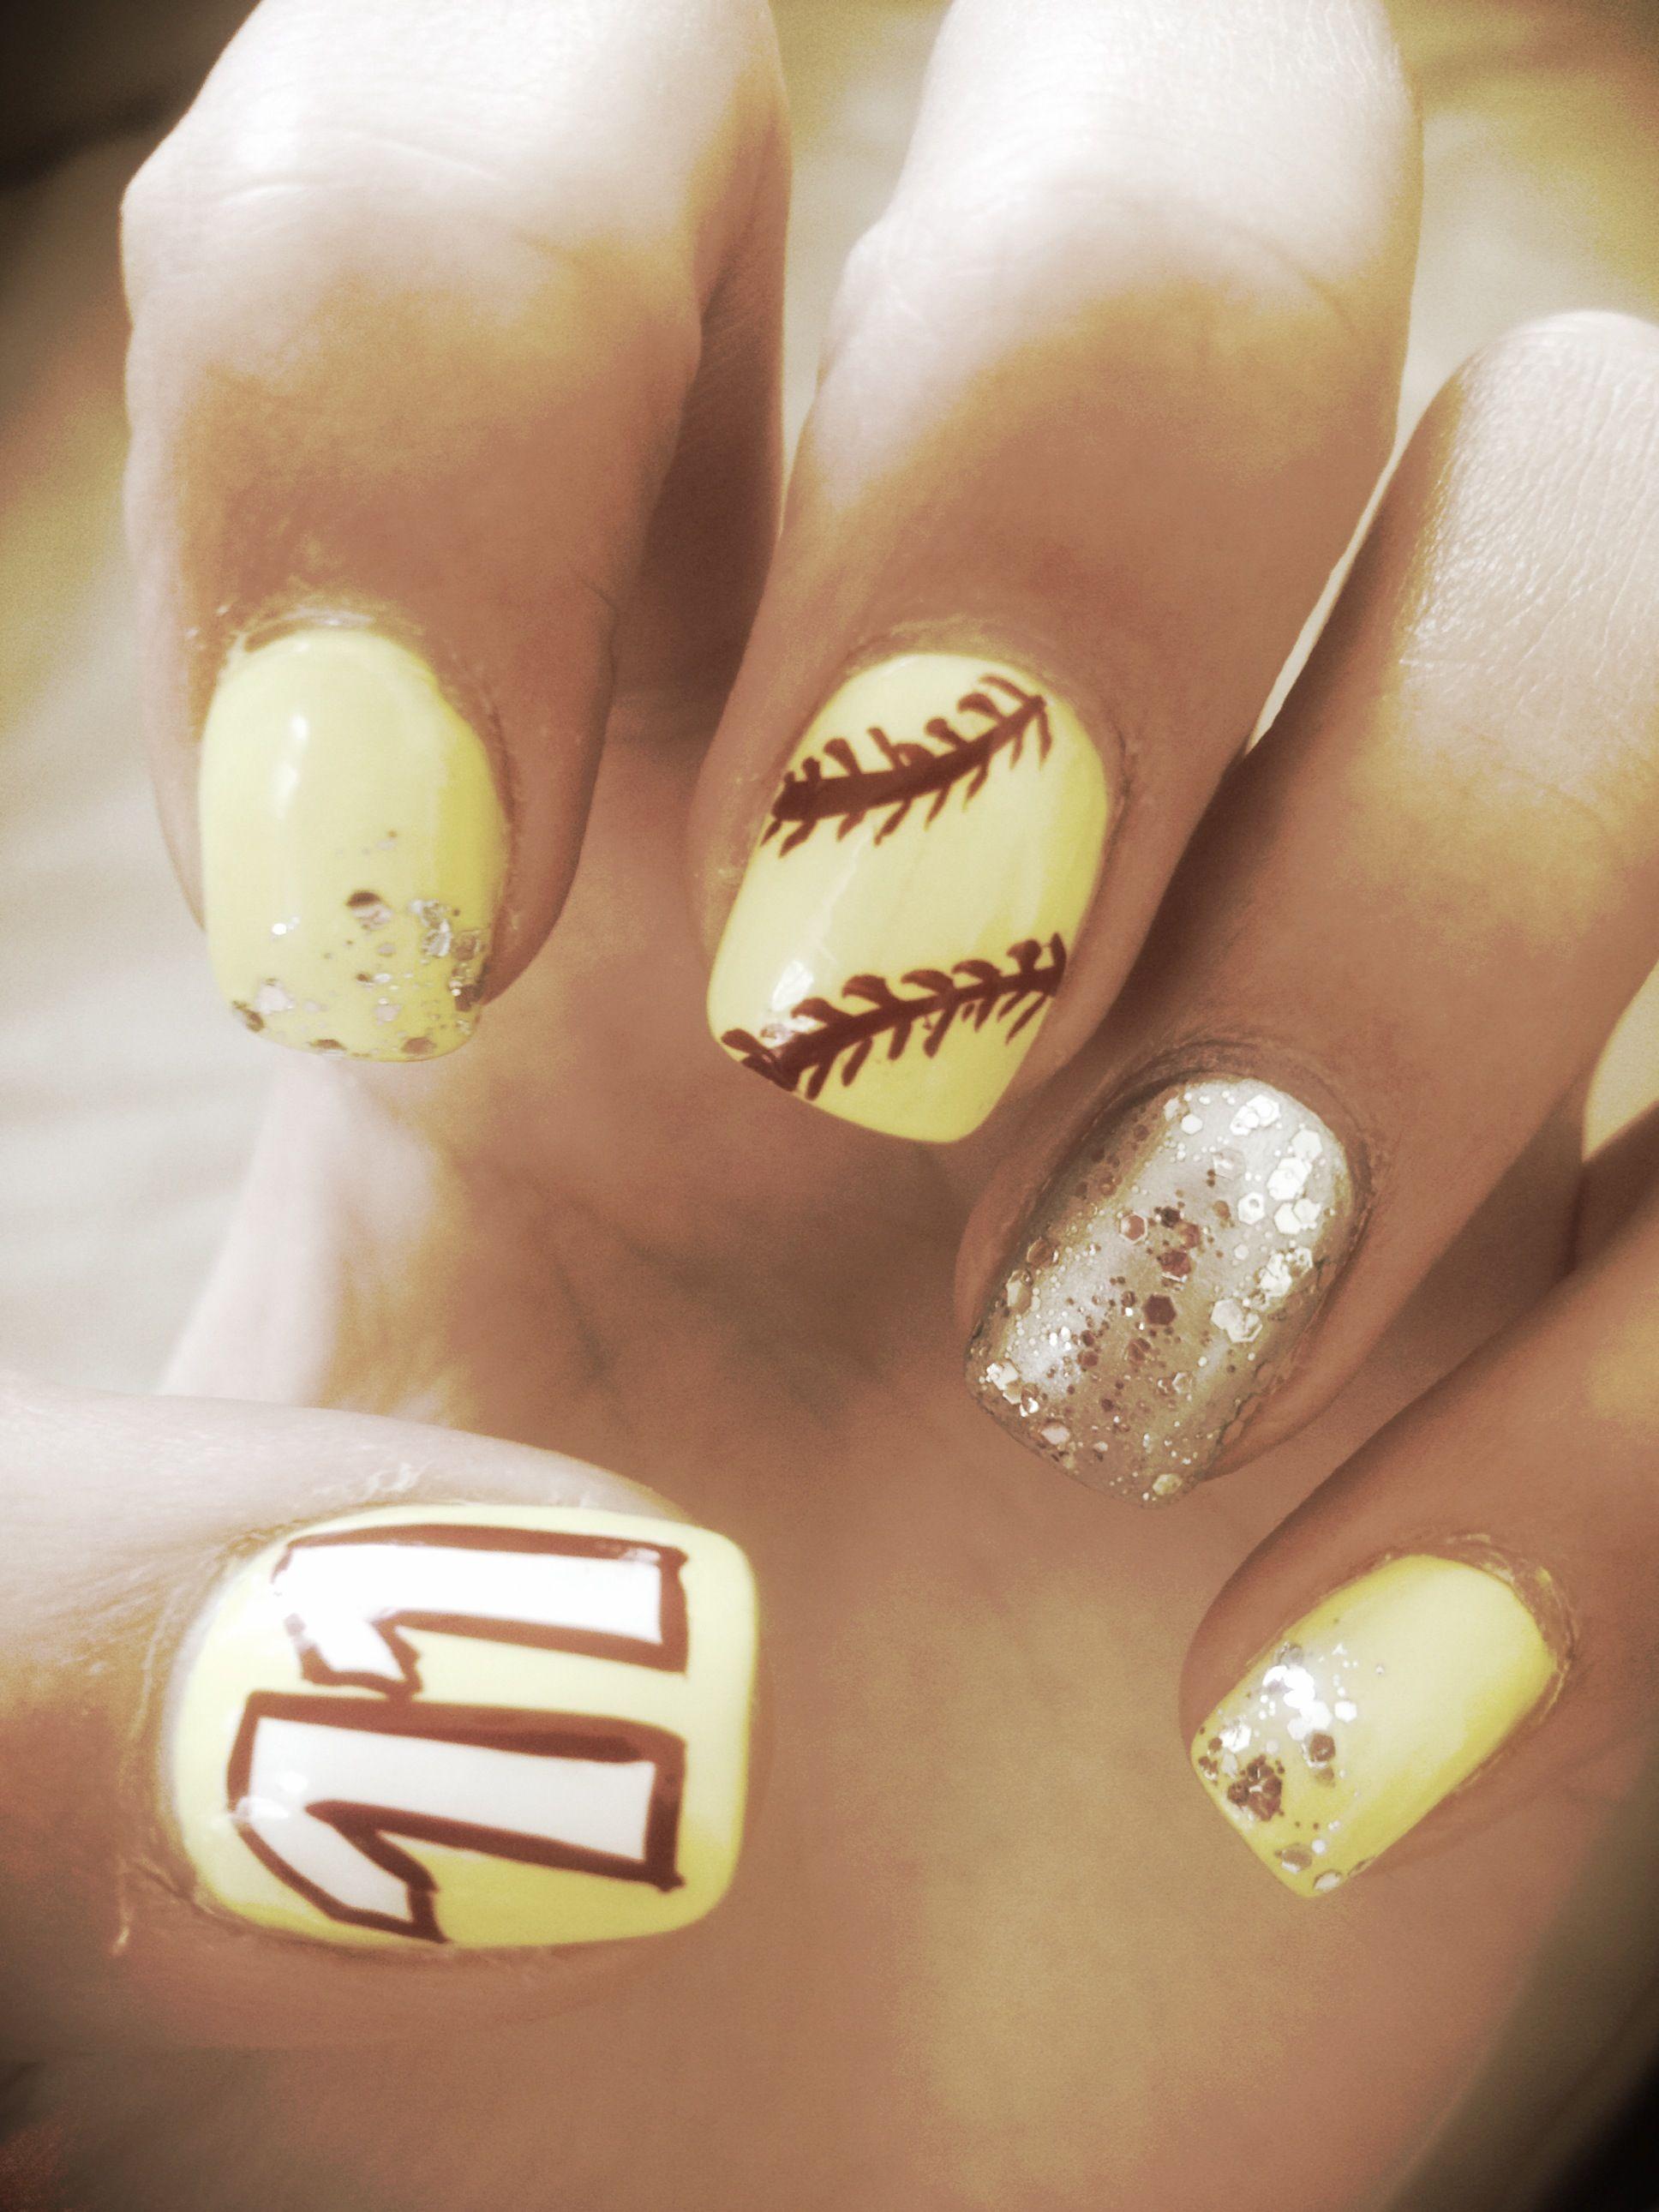 Softball Nails Great 4 All Sports Like Basketball Me